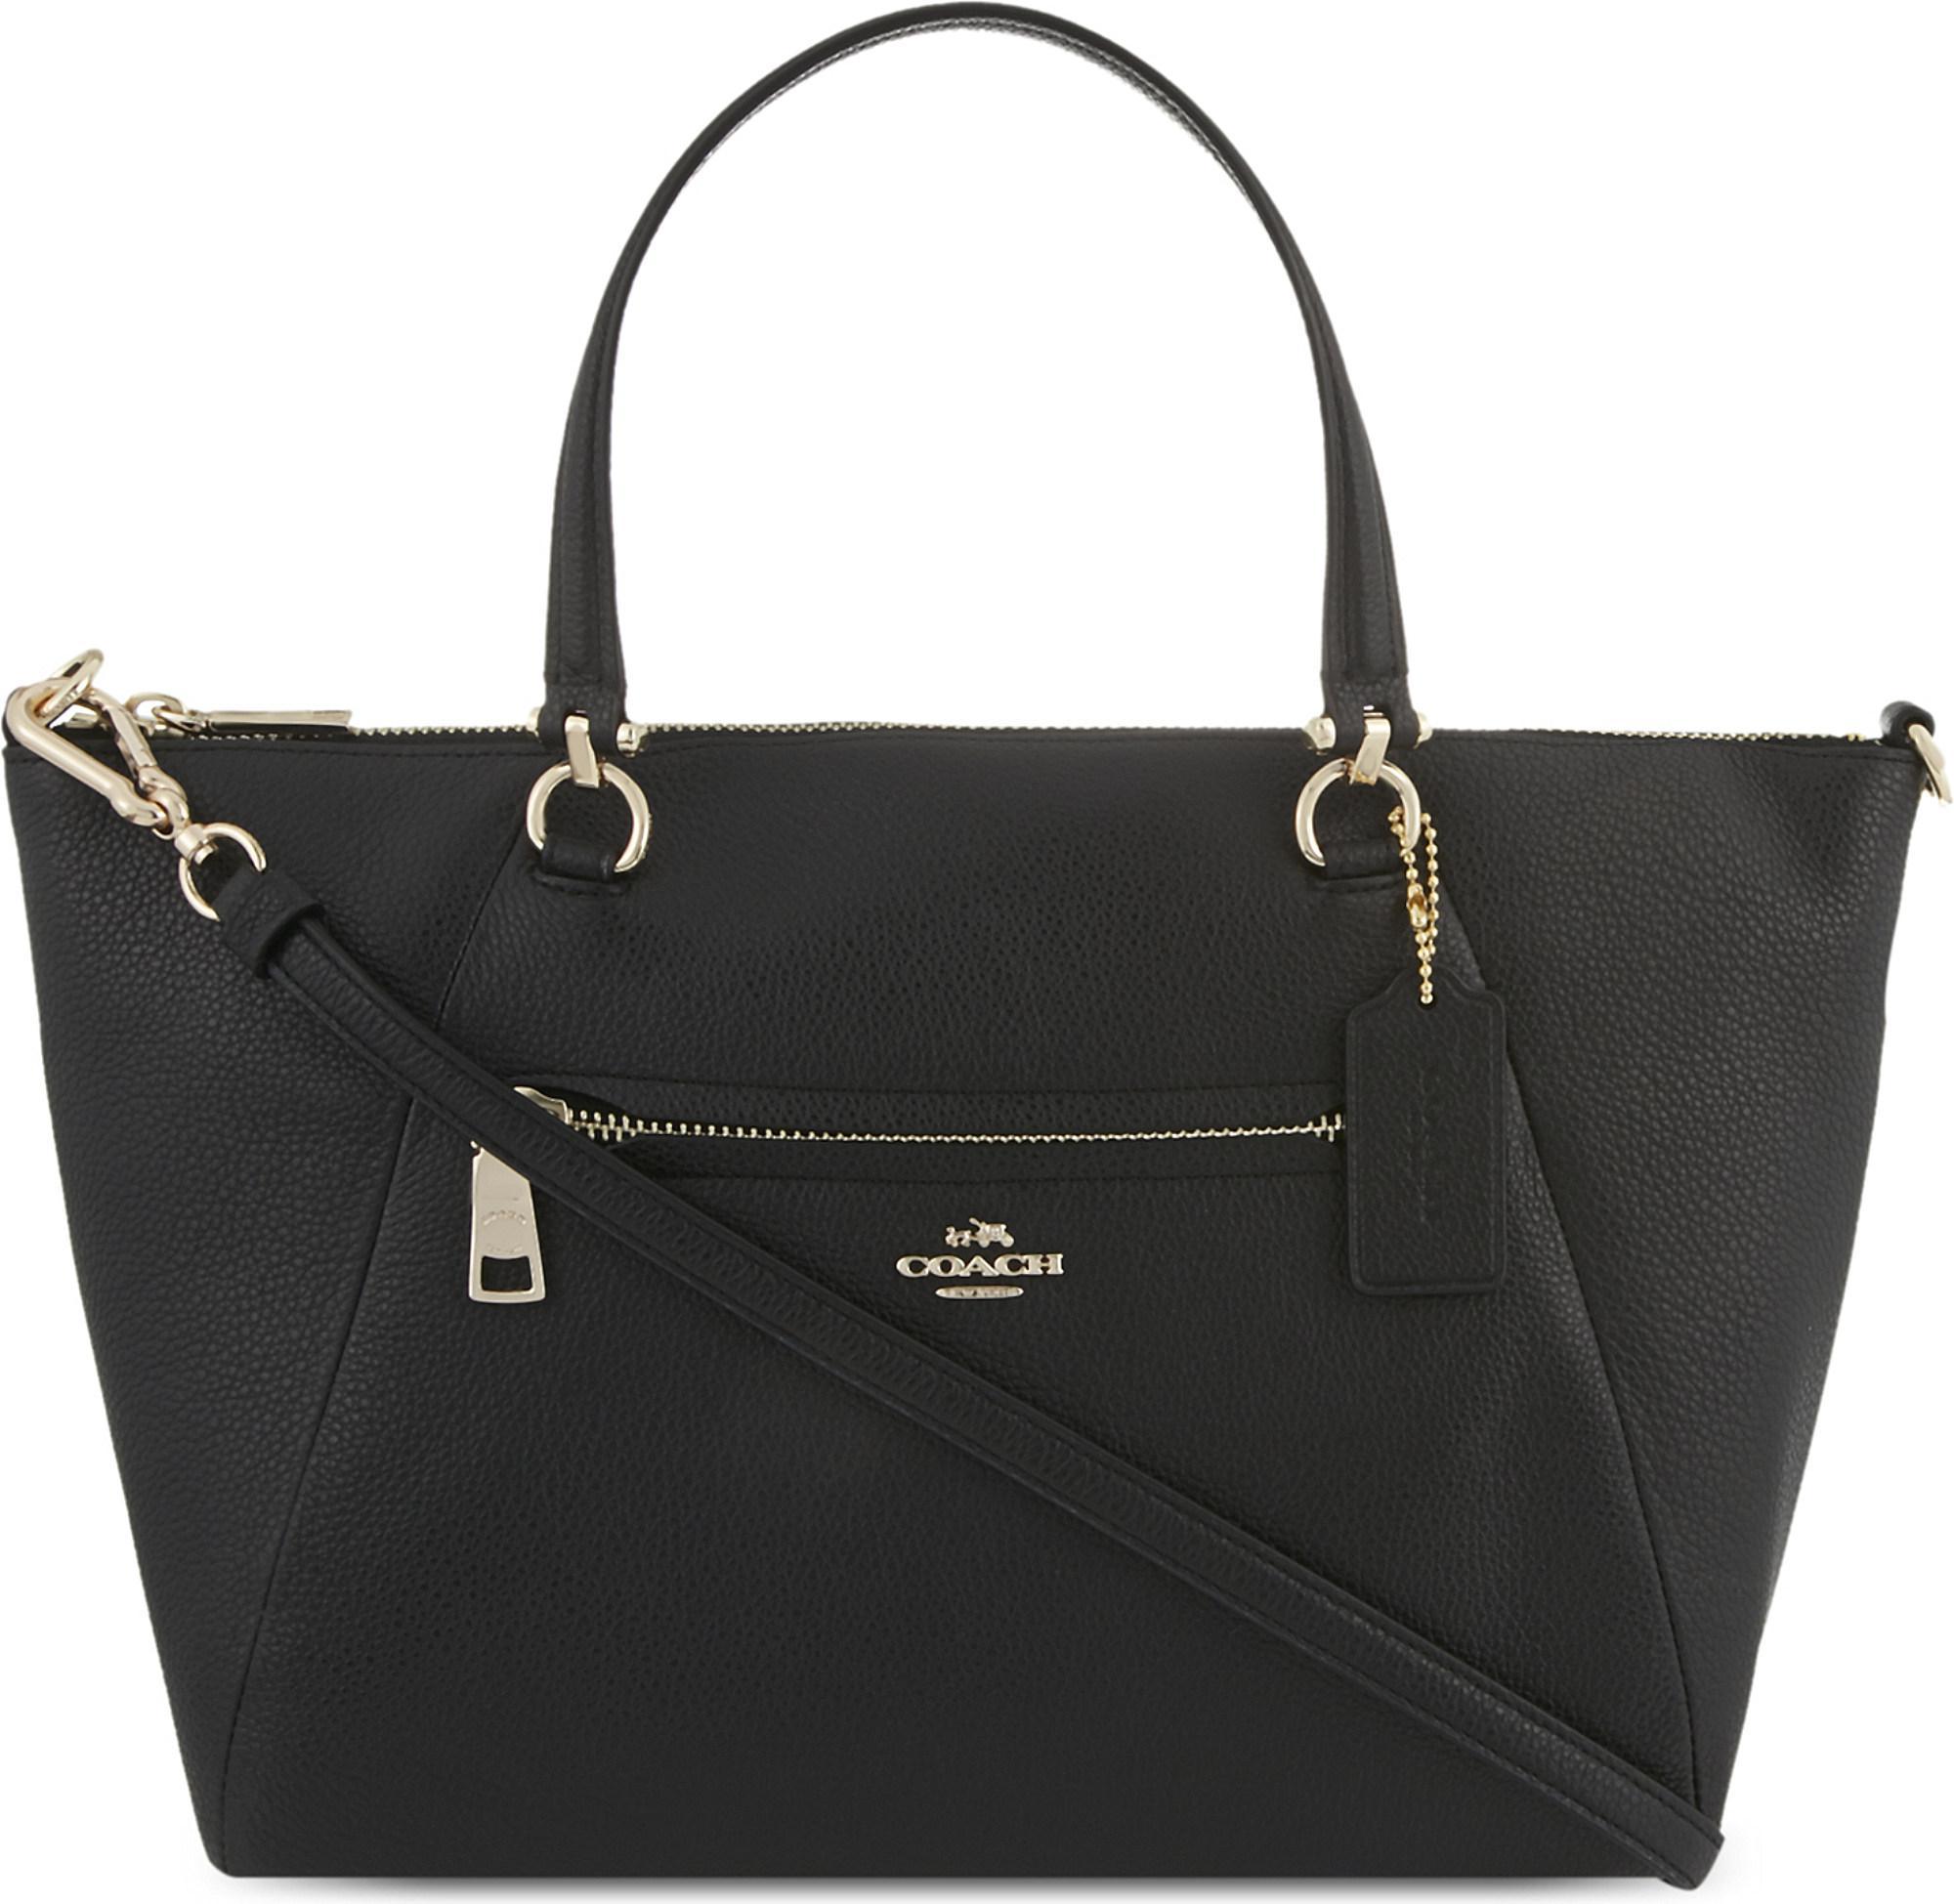 22fb418534c4 Lyst - COACH Mercer 24 Leather Cross-body Bag in Black - Save 43%